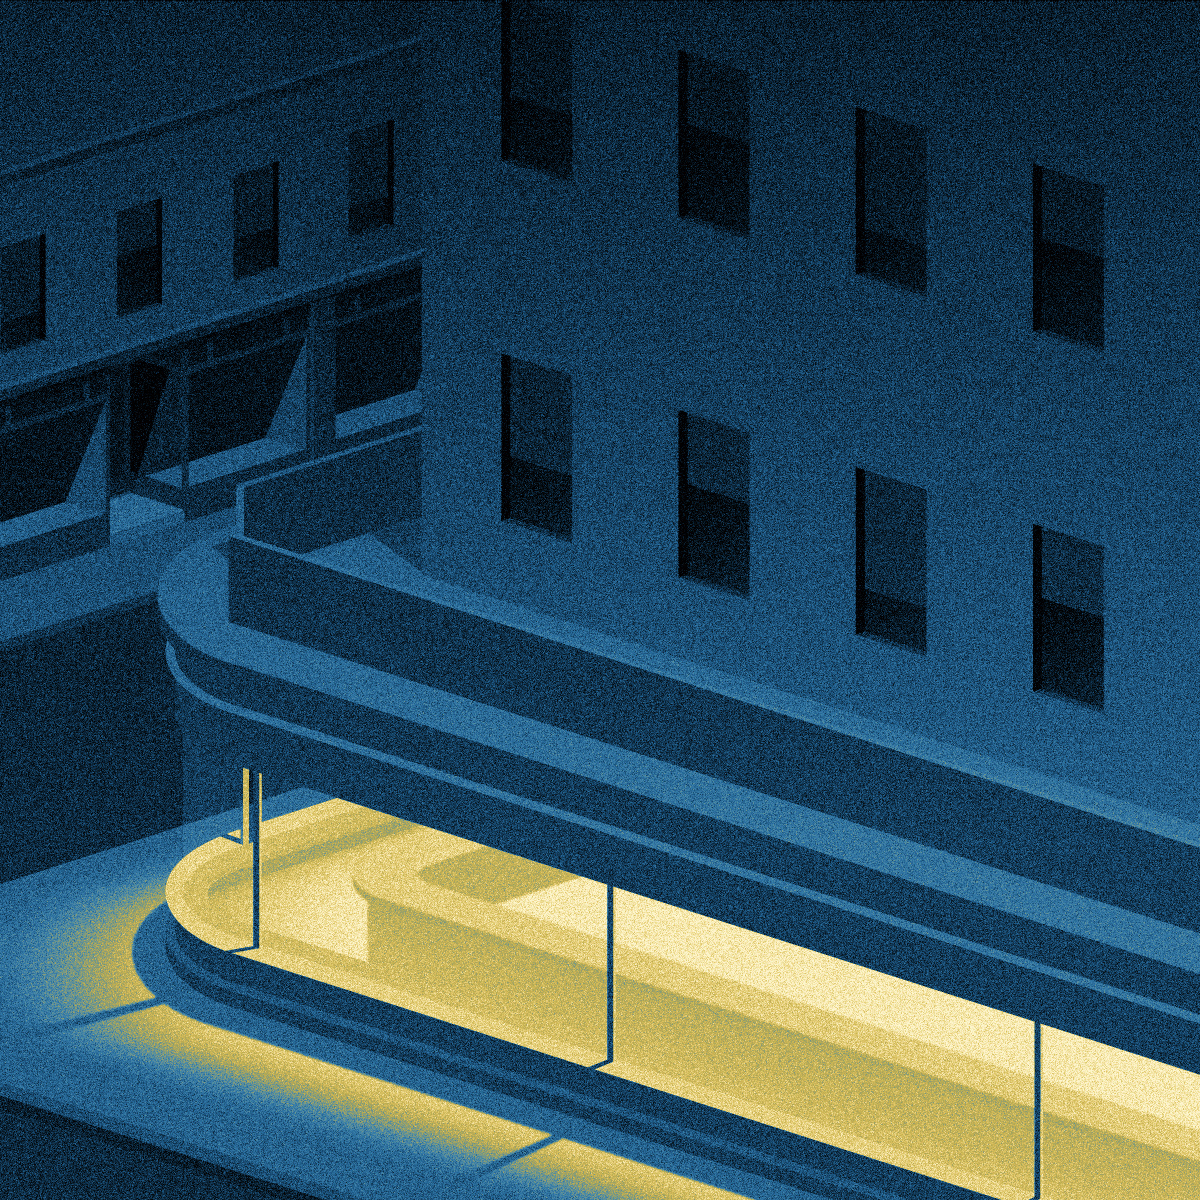 Digital Illustrations of City at Night (10 pics)